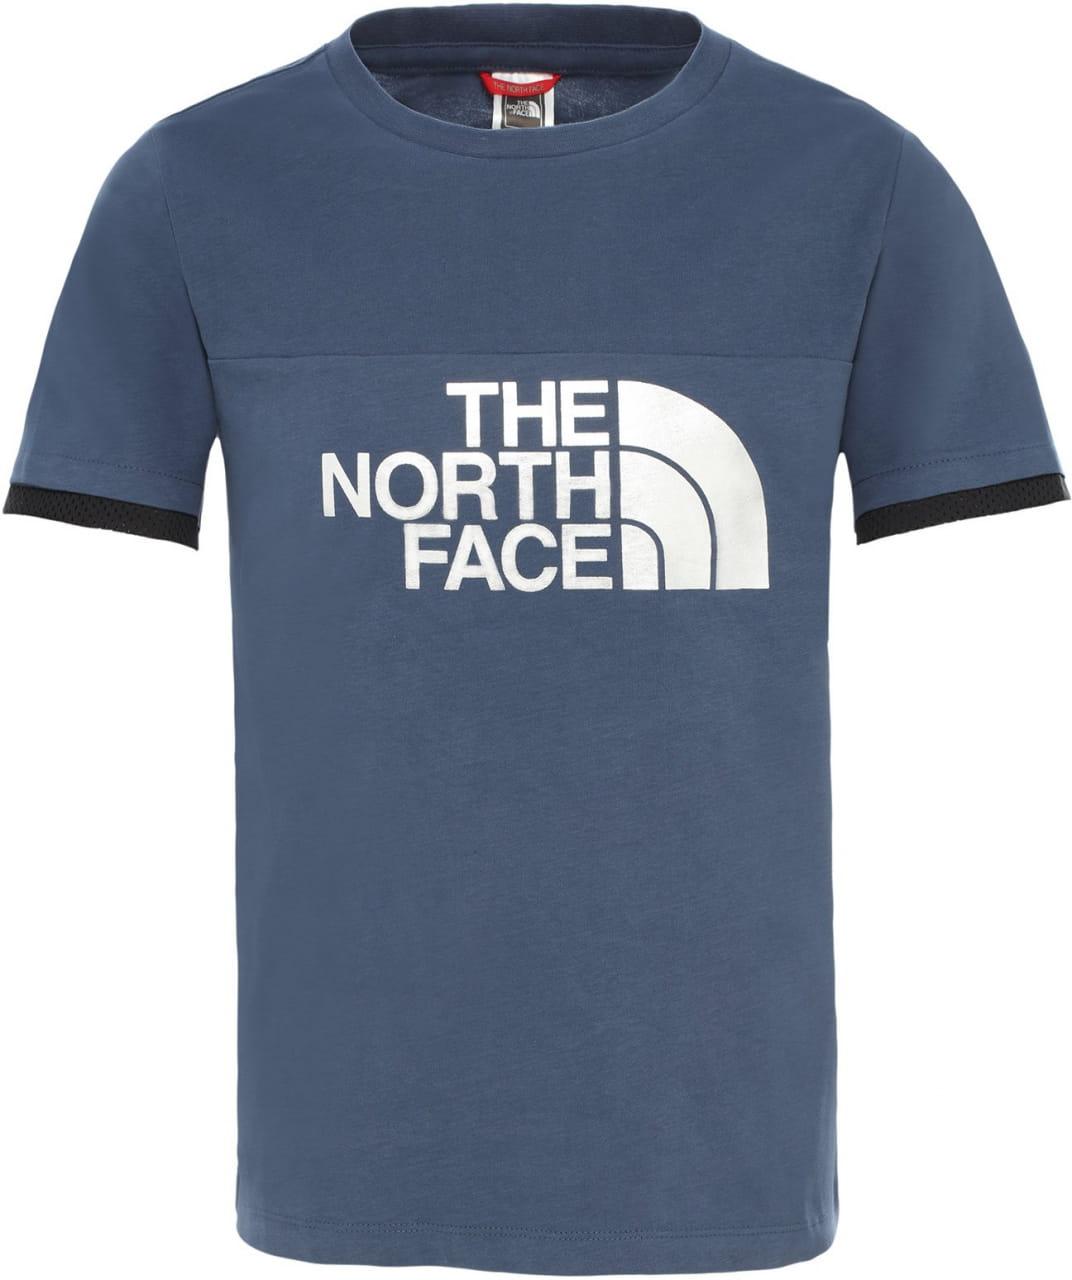 T-Shirts The North Face Girls' Rafiki T-Shirt